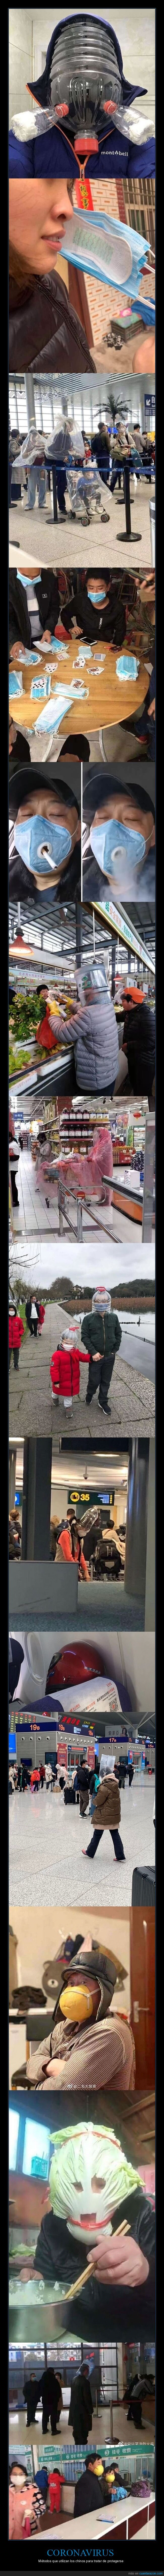 chinos,coronavirus,protegerse